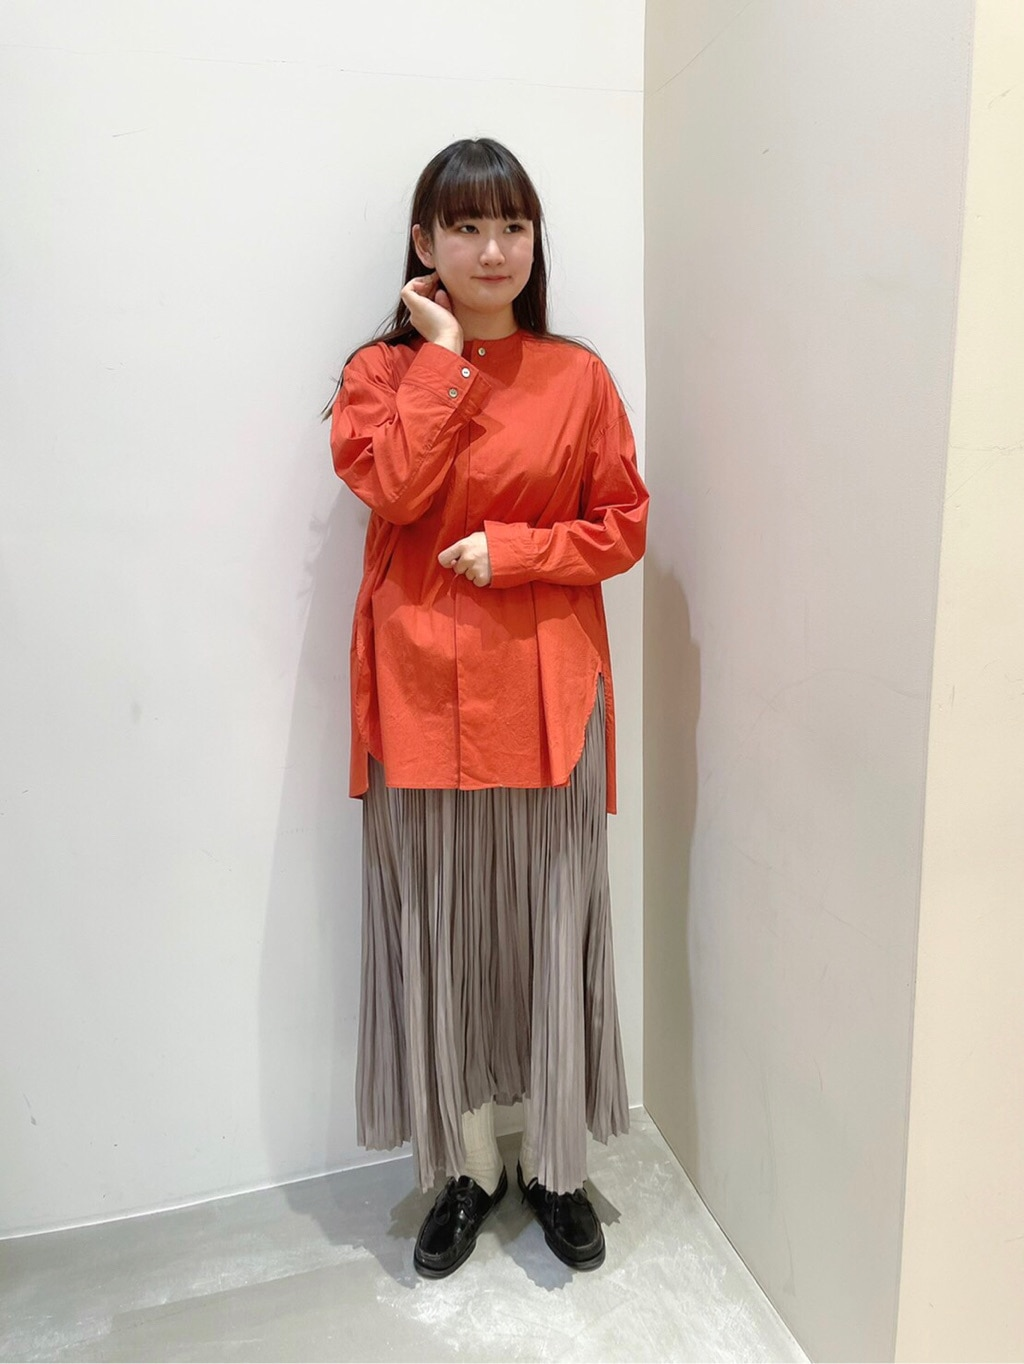 bulle de savon 阪急西宮ガーデンズ 身長:166cm 2021.02.09